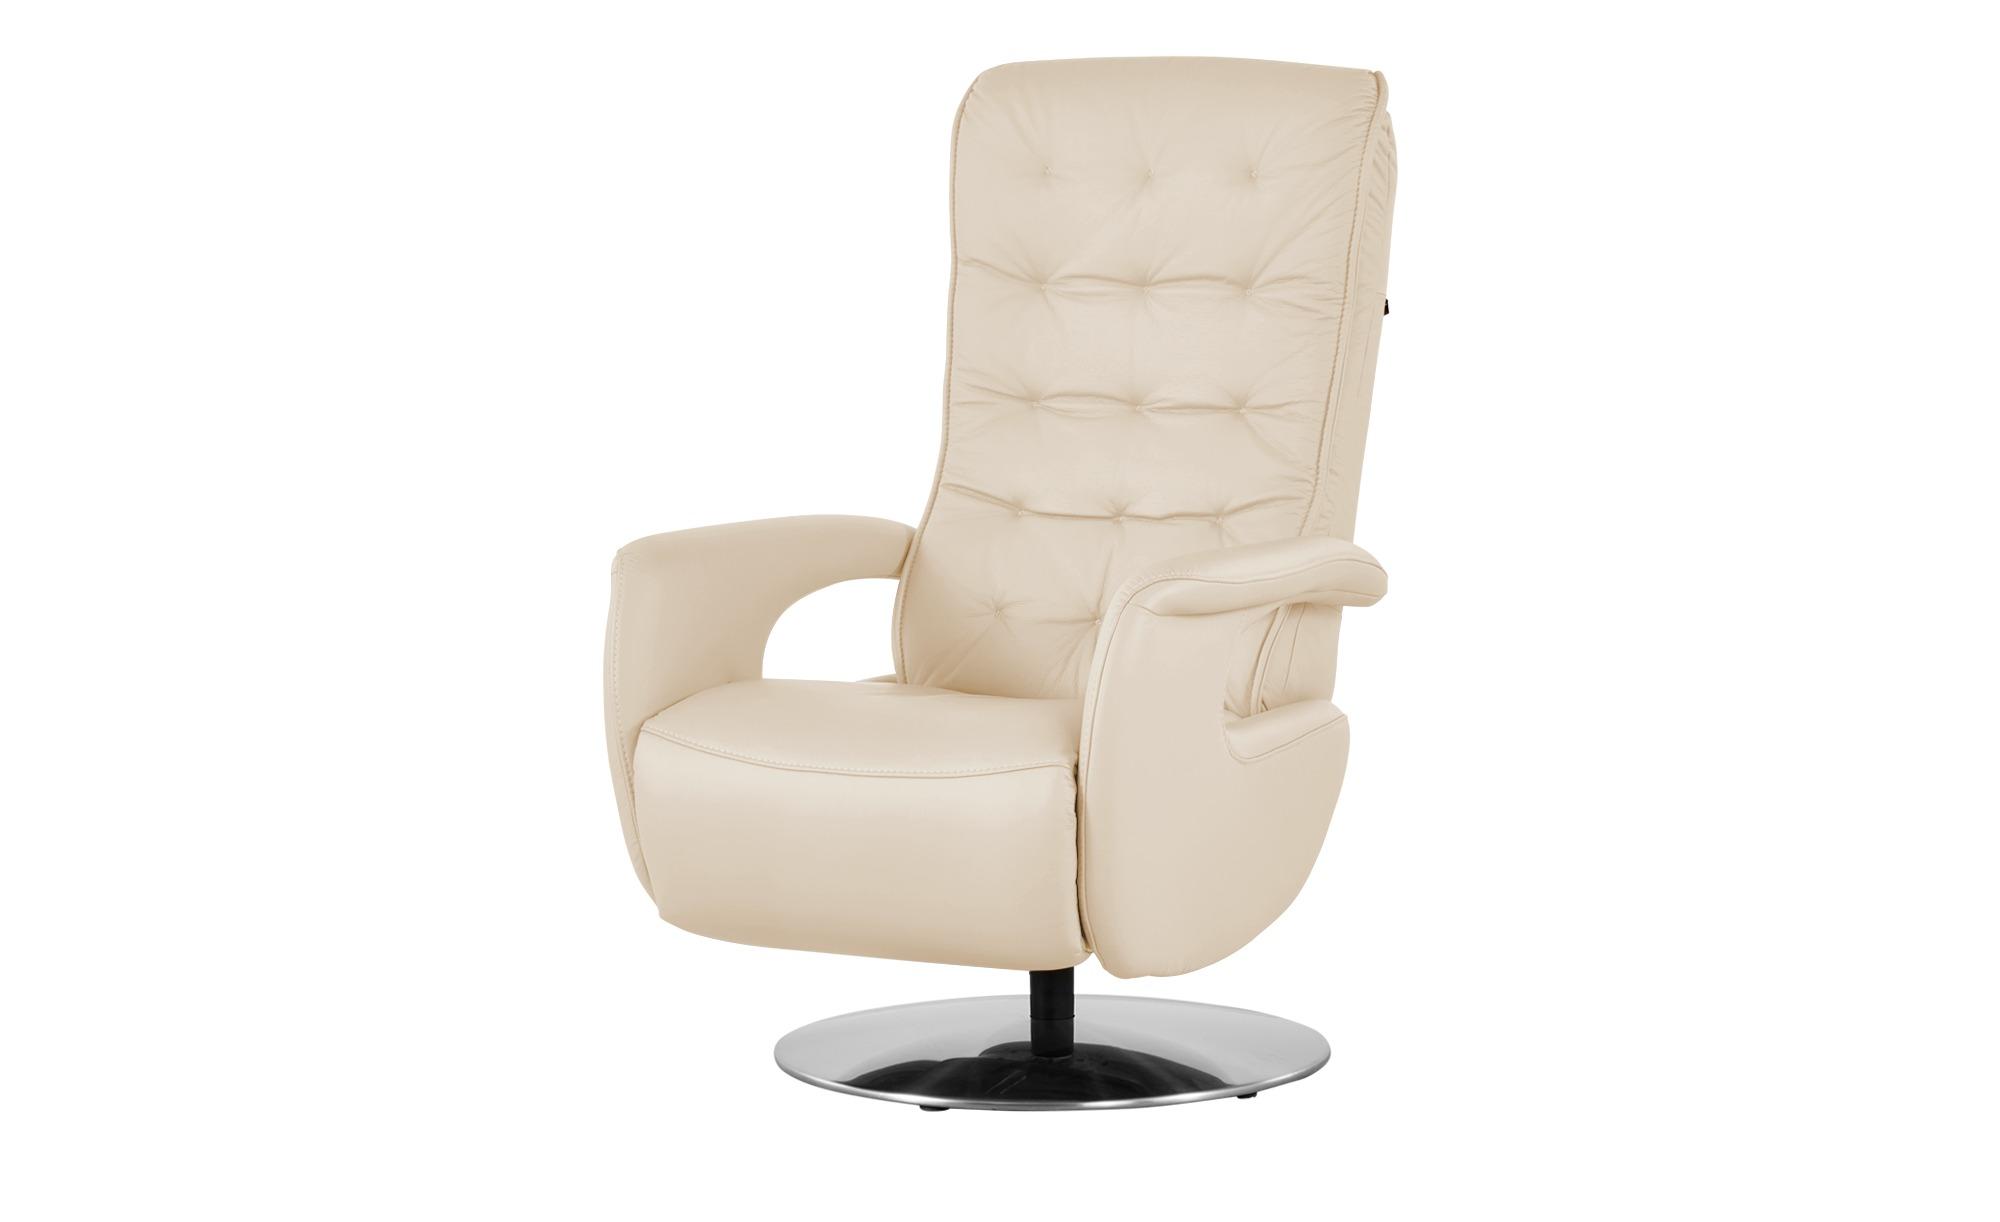 Hukla Relaxsessel  Smilla ¦ creme ¦ Maße (cm): B: 72 H: 113 T: 83 Polstermöbel > Sessel > Ledersessel - Höffner